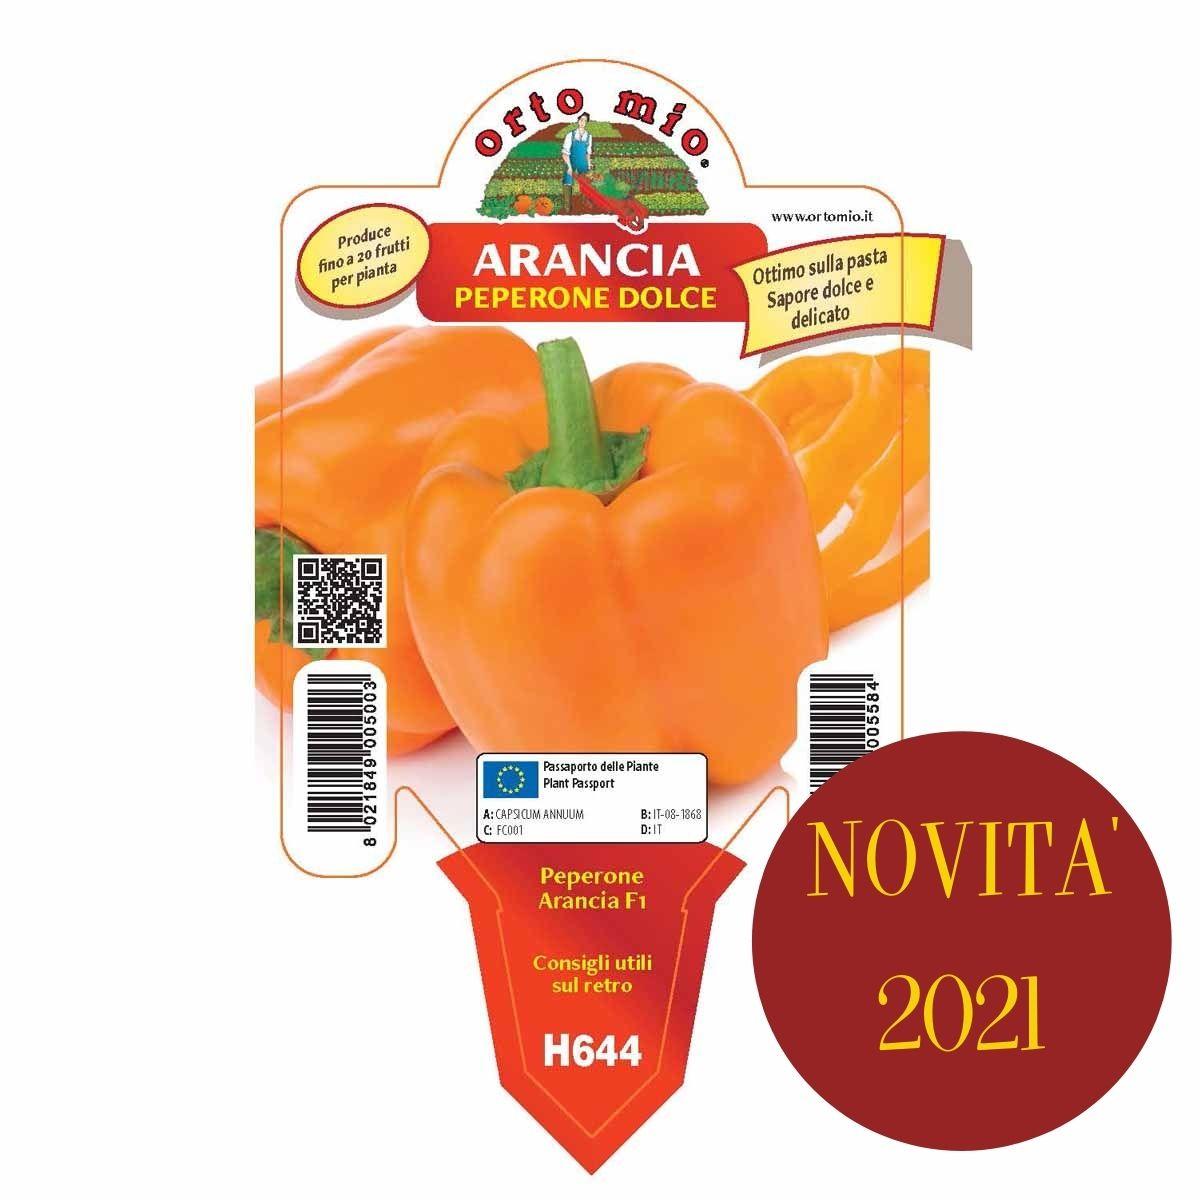 Peperone Quadrato Arancione var. Arancia F1